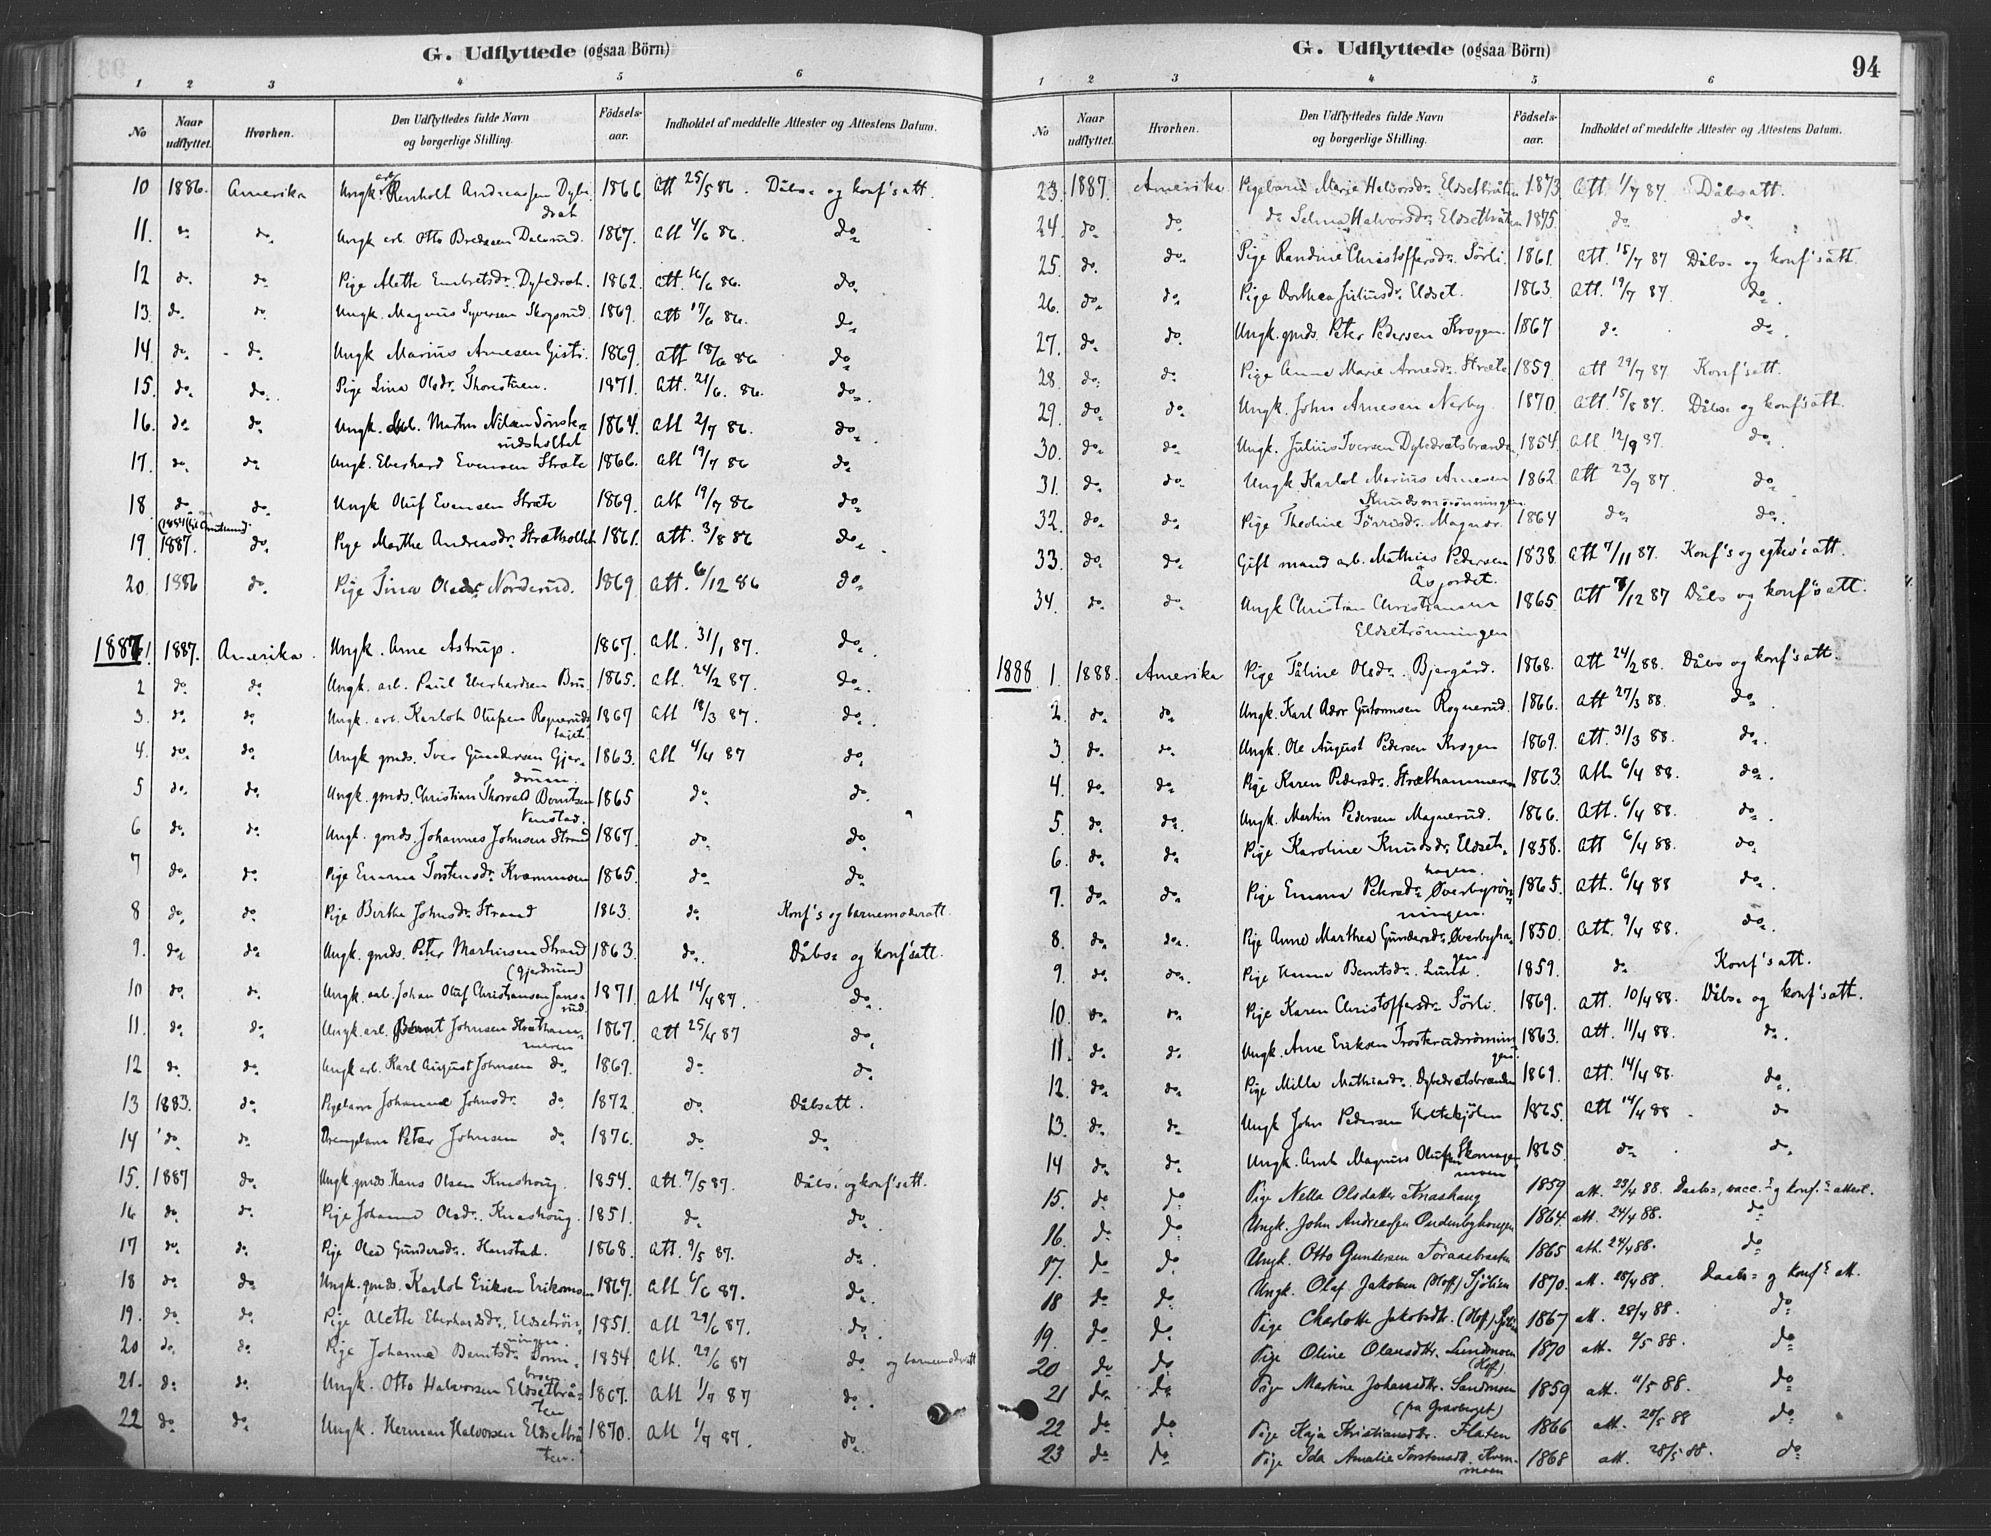 SAH, Våler prestekontor, Ministerialbok nr. 4, 1879-1893, s. 94